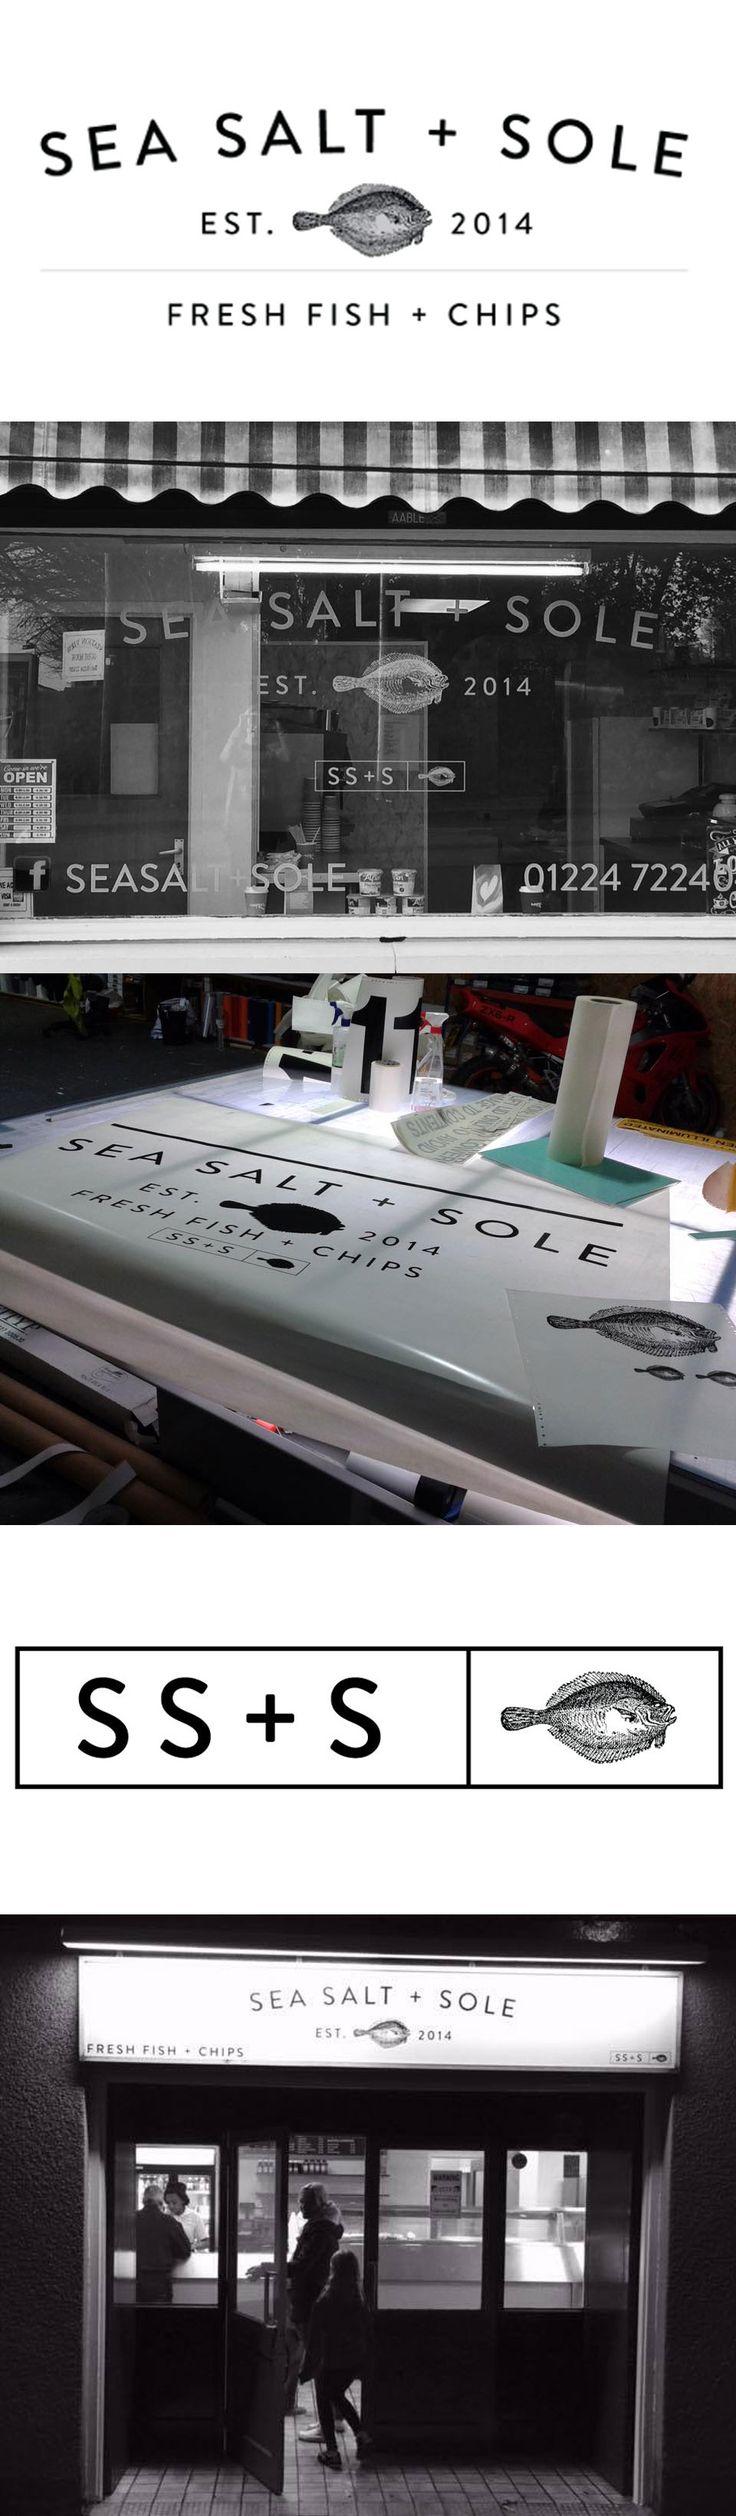 Sea Salt + Sole Branding    A family owned fish & chip takeaway shop.   Dice | Aberdeen | Scotland